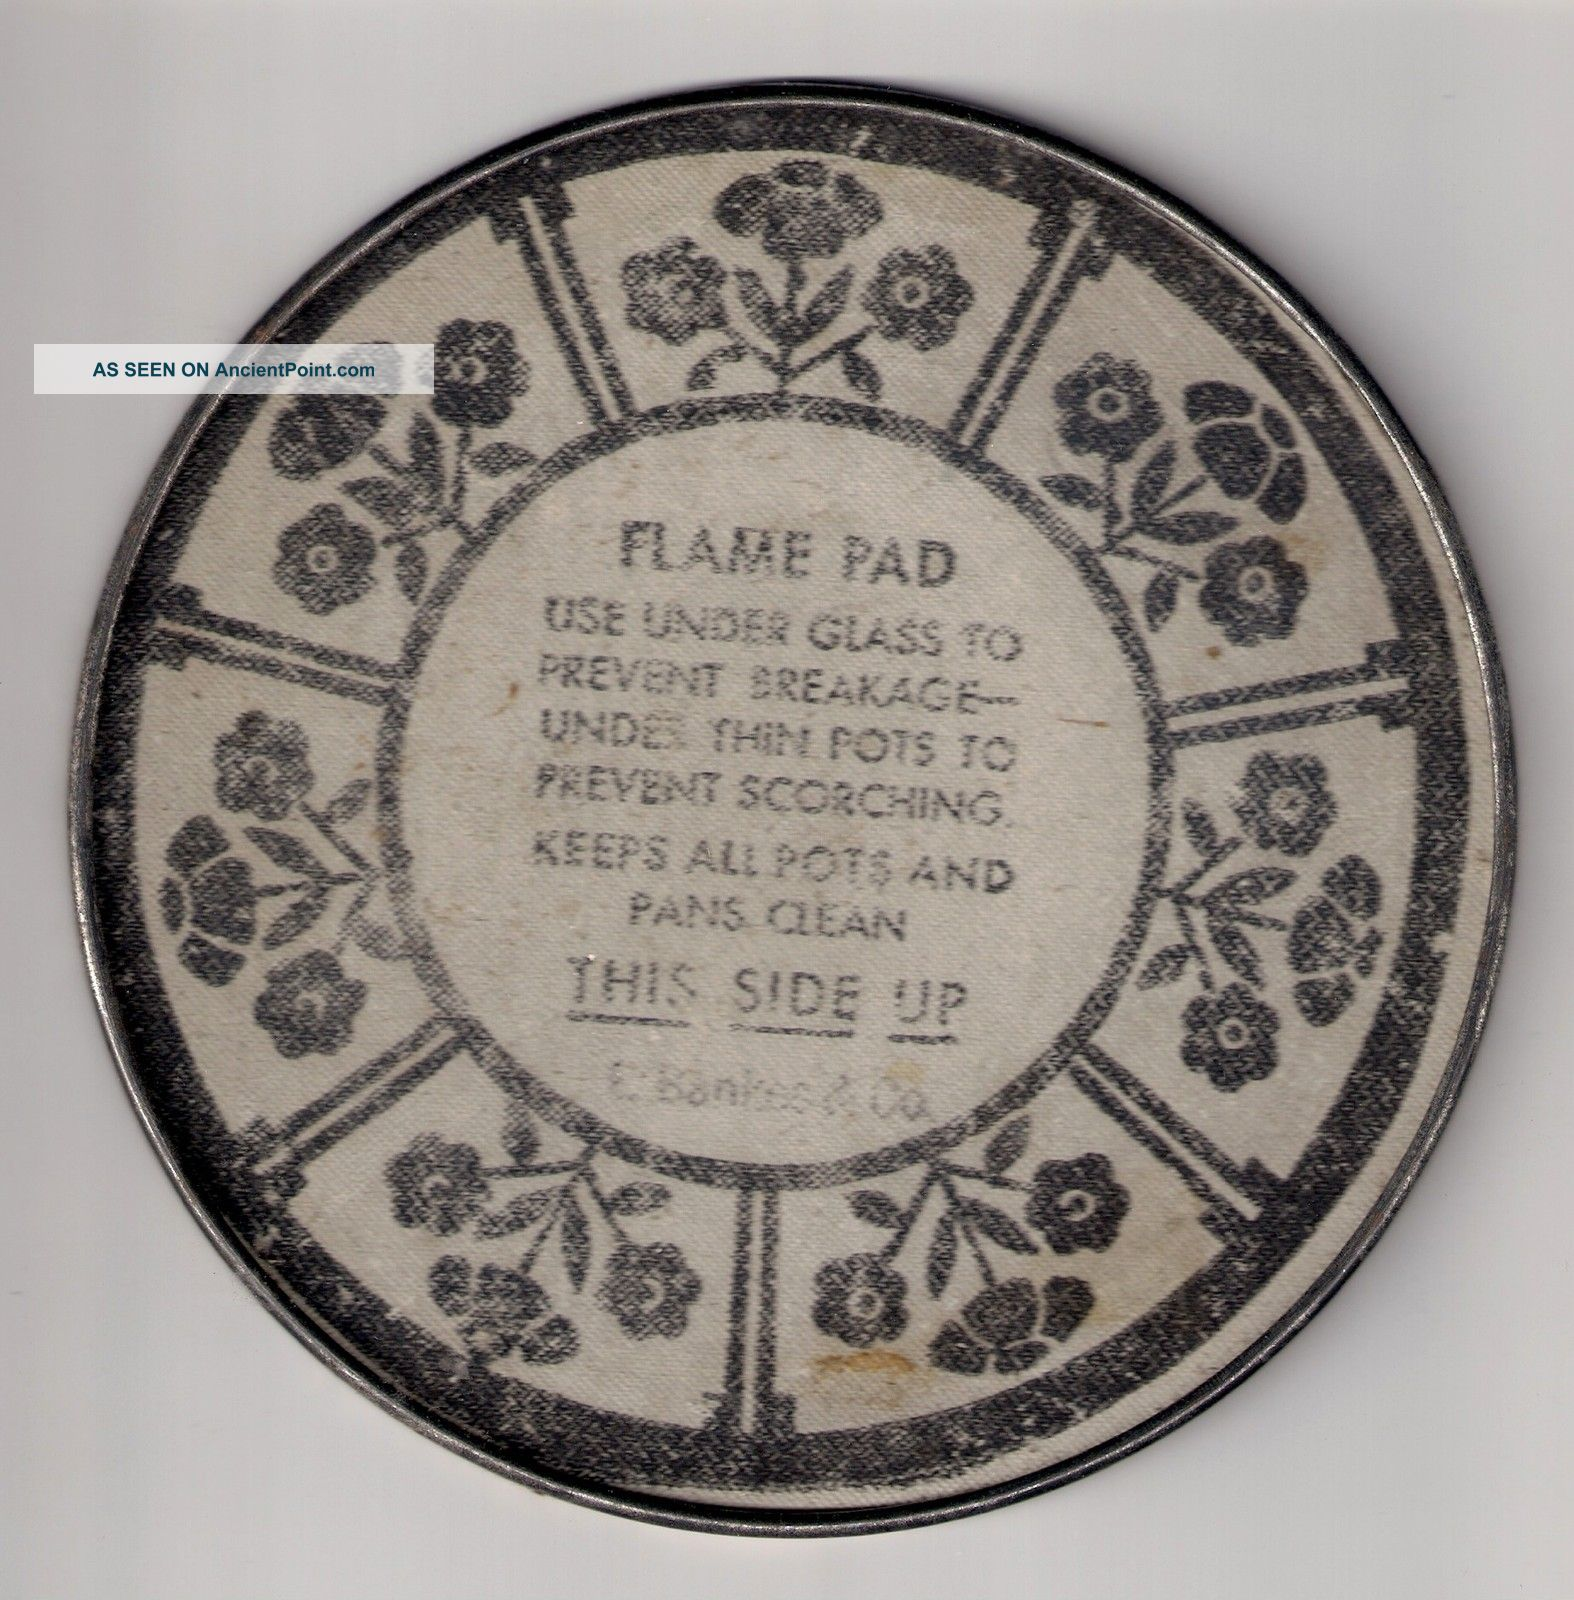 Antique Flame Pad,  Hot Pad,  E.  Bankes & Co. ,  Metal Trivet,  Vintage Hot Pad, Trivets photo